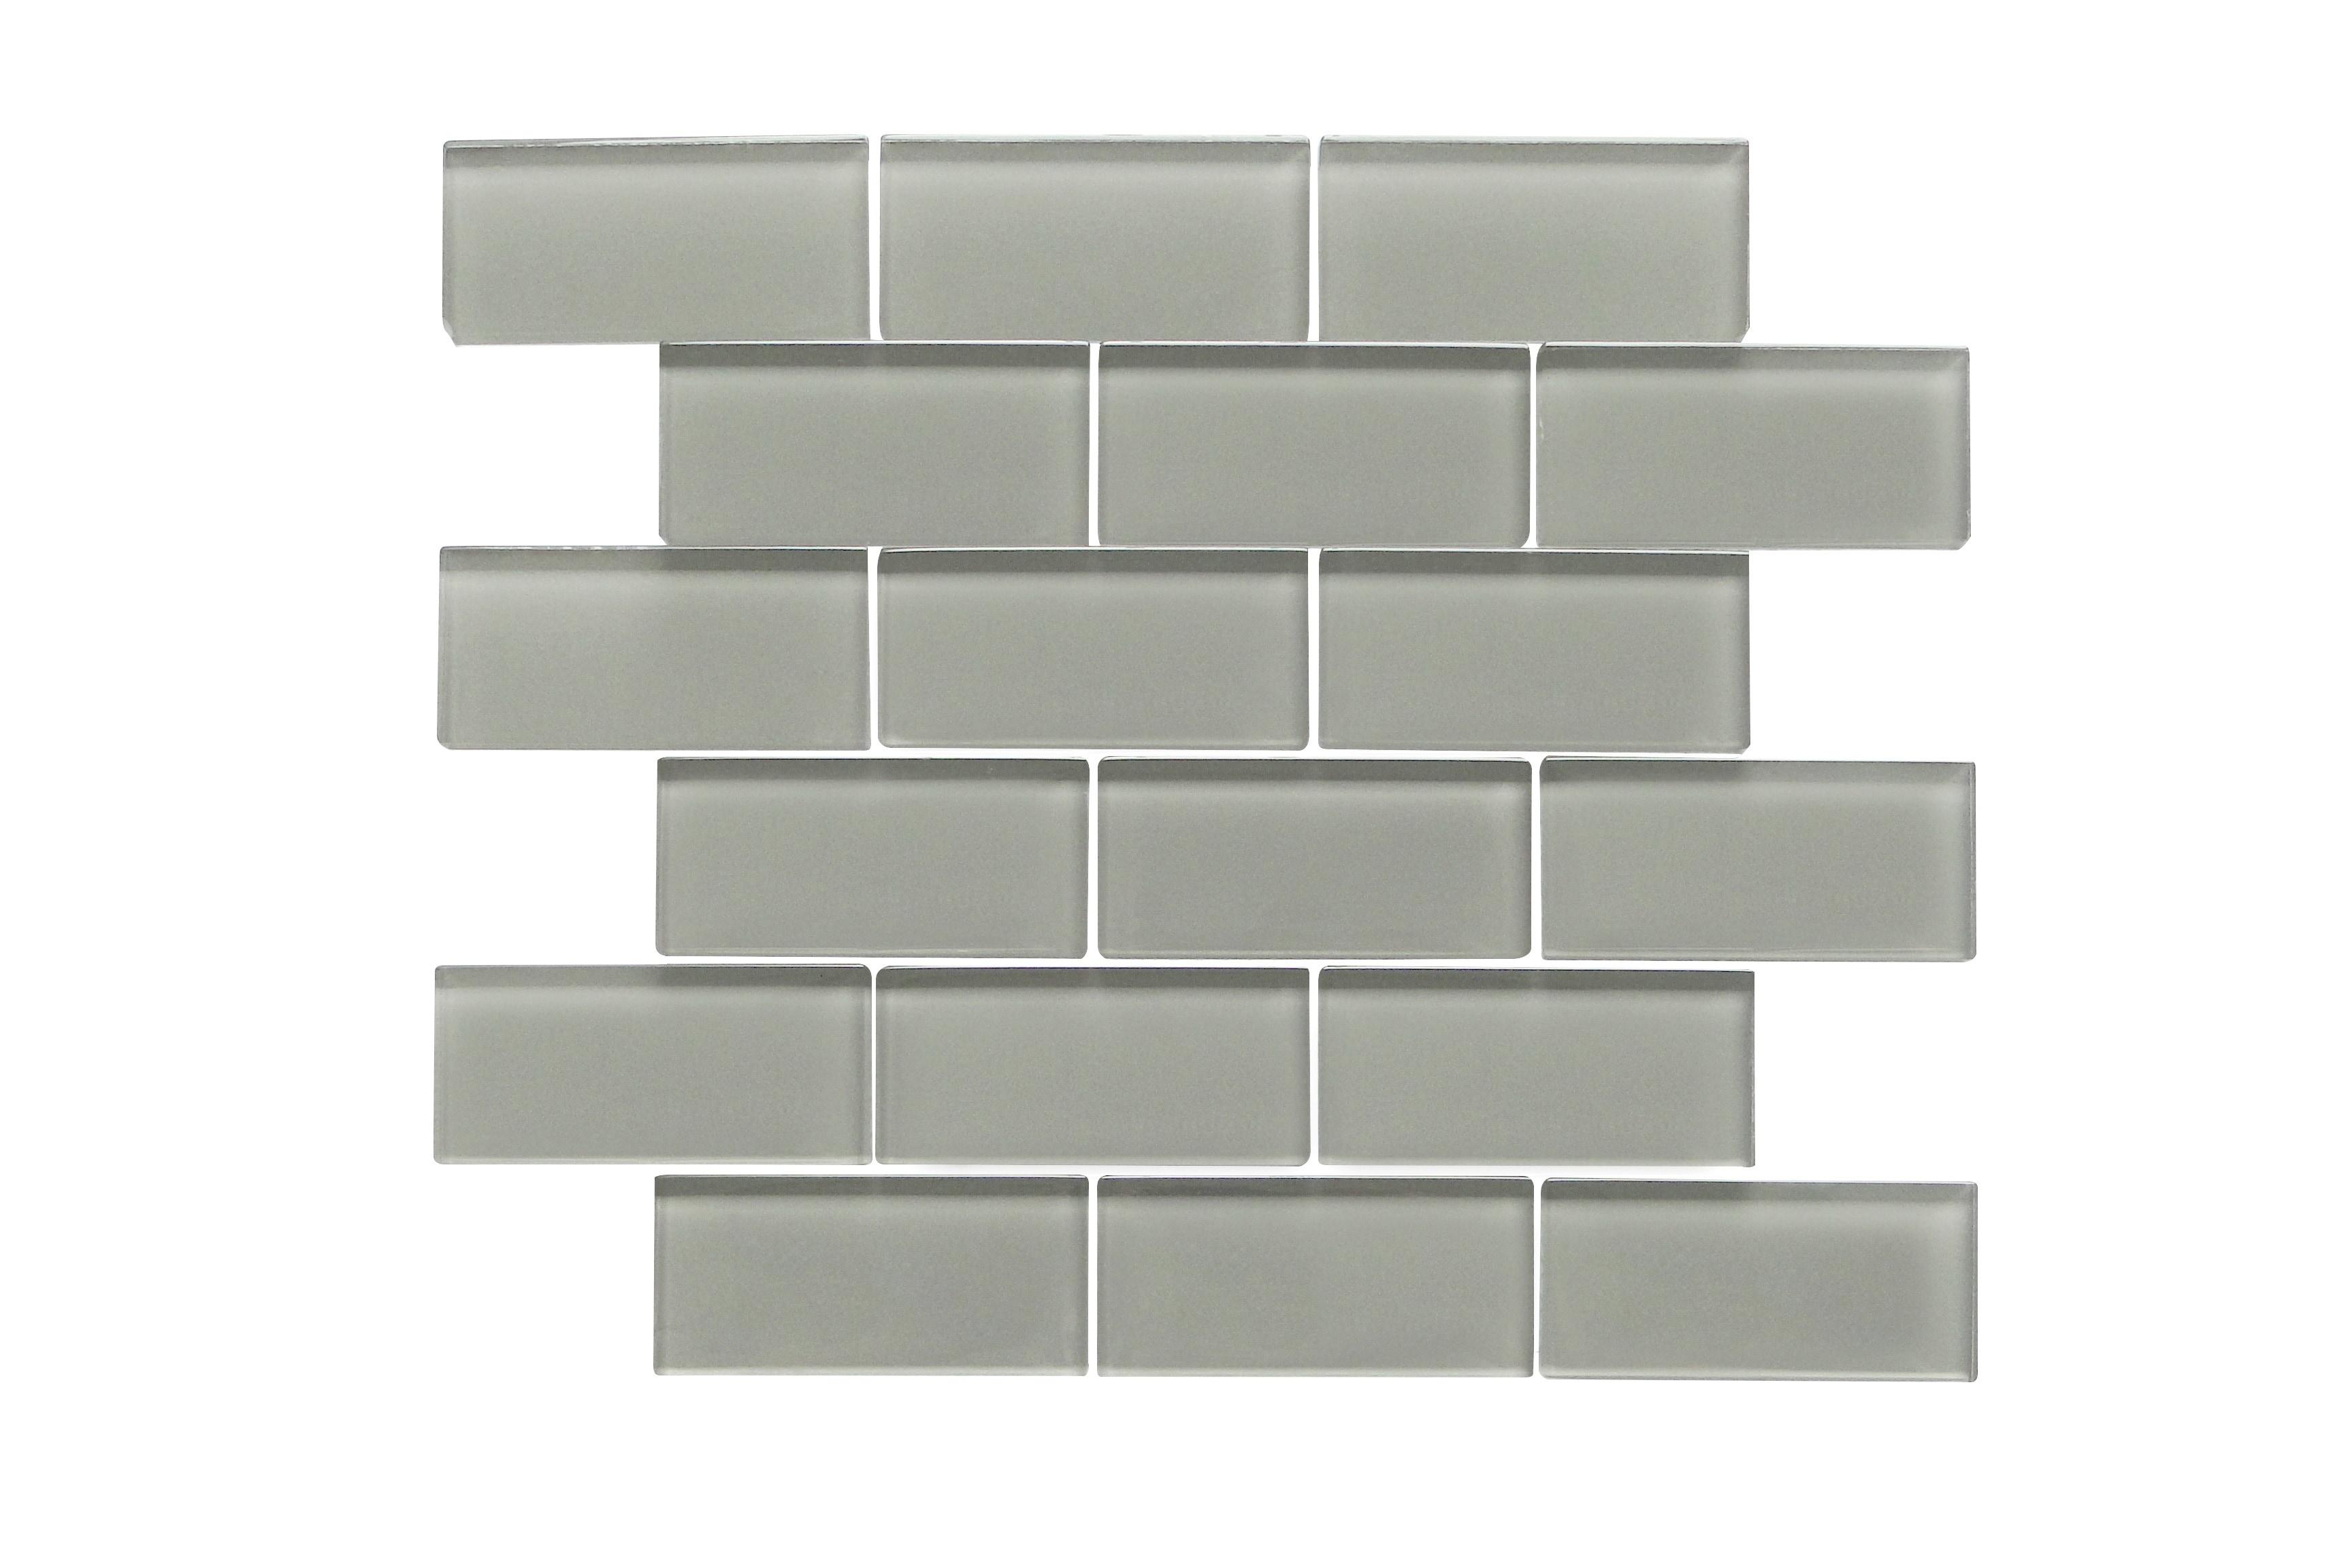 "Glass Mosaic / 14 x 12 x 0.31 inches / Glossy 2"" X 4"" Glass Subway Mosaic Tile In Dark Gray 0"